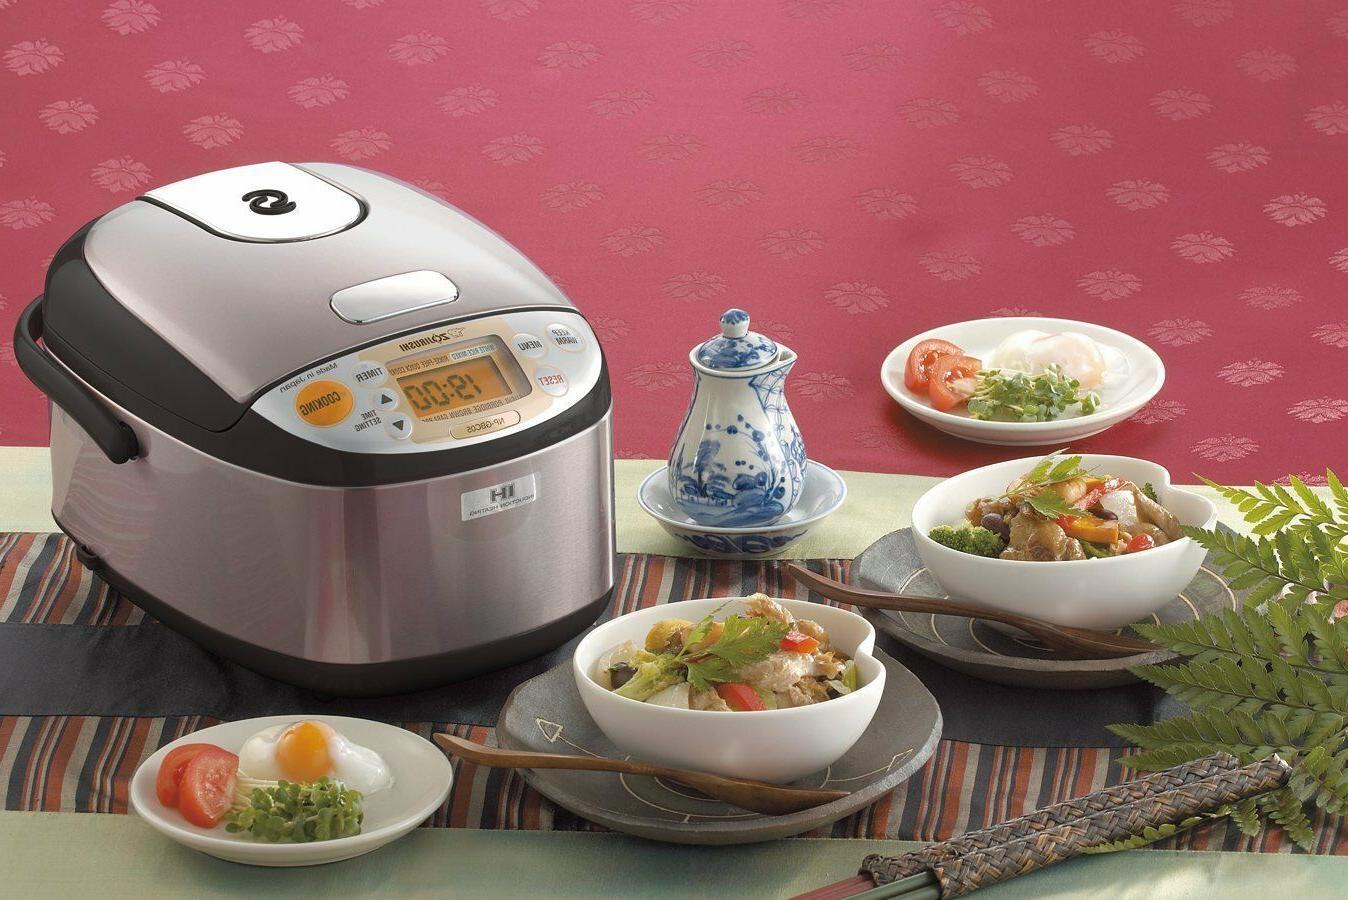 Zojirushi NP-GBC05-XT Heating System Rice & Warmer